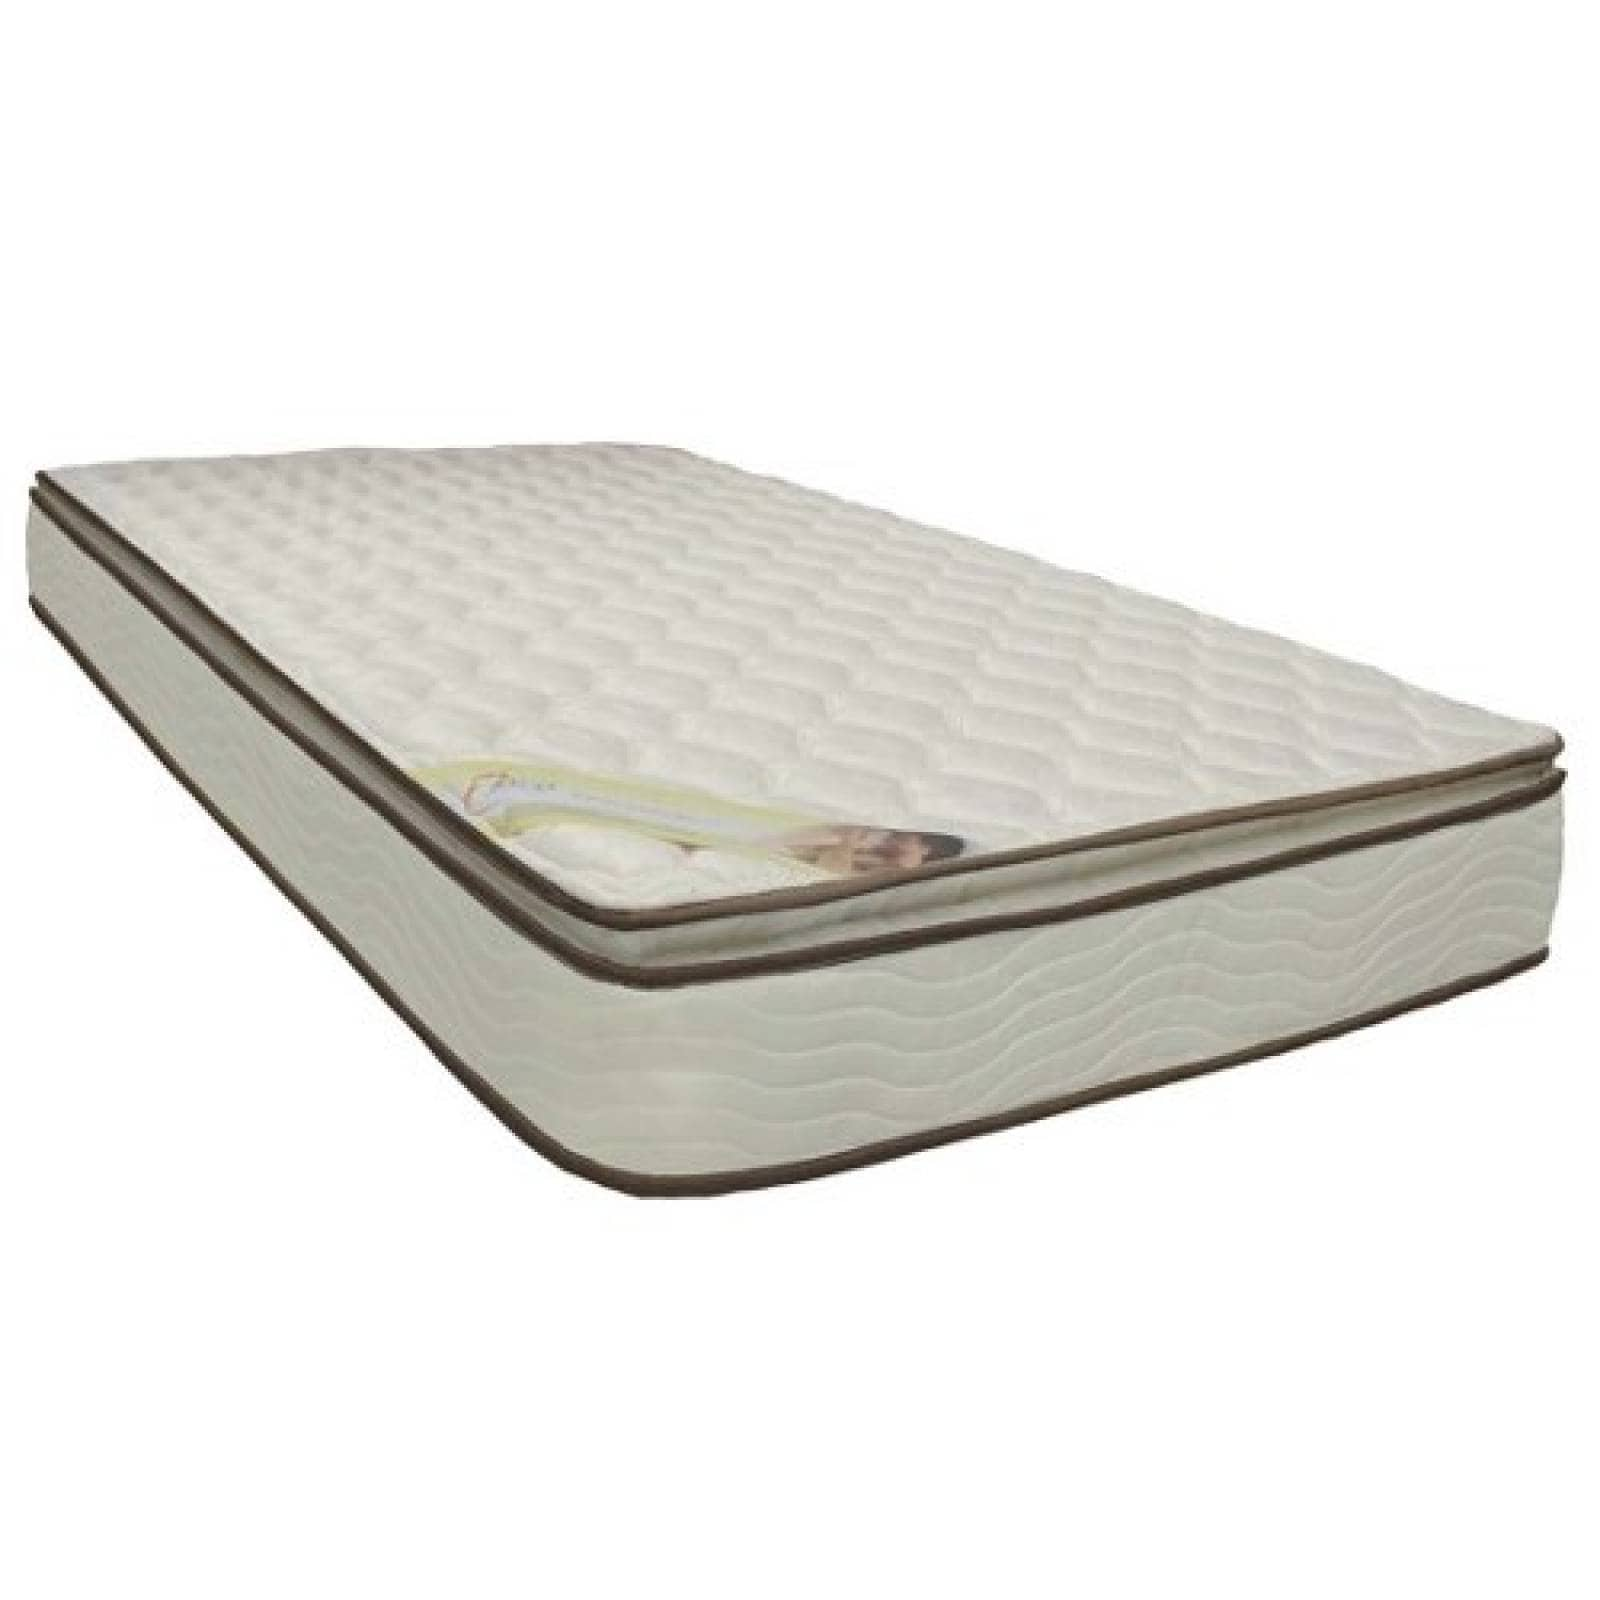 Colchon Super Ortopedico Restonic Individual SleepMart S/Box